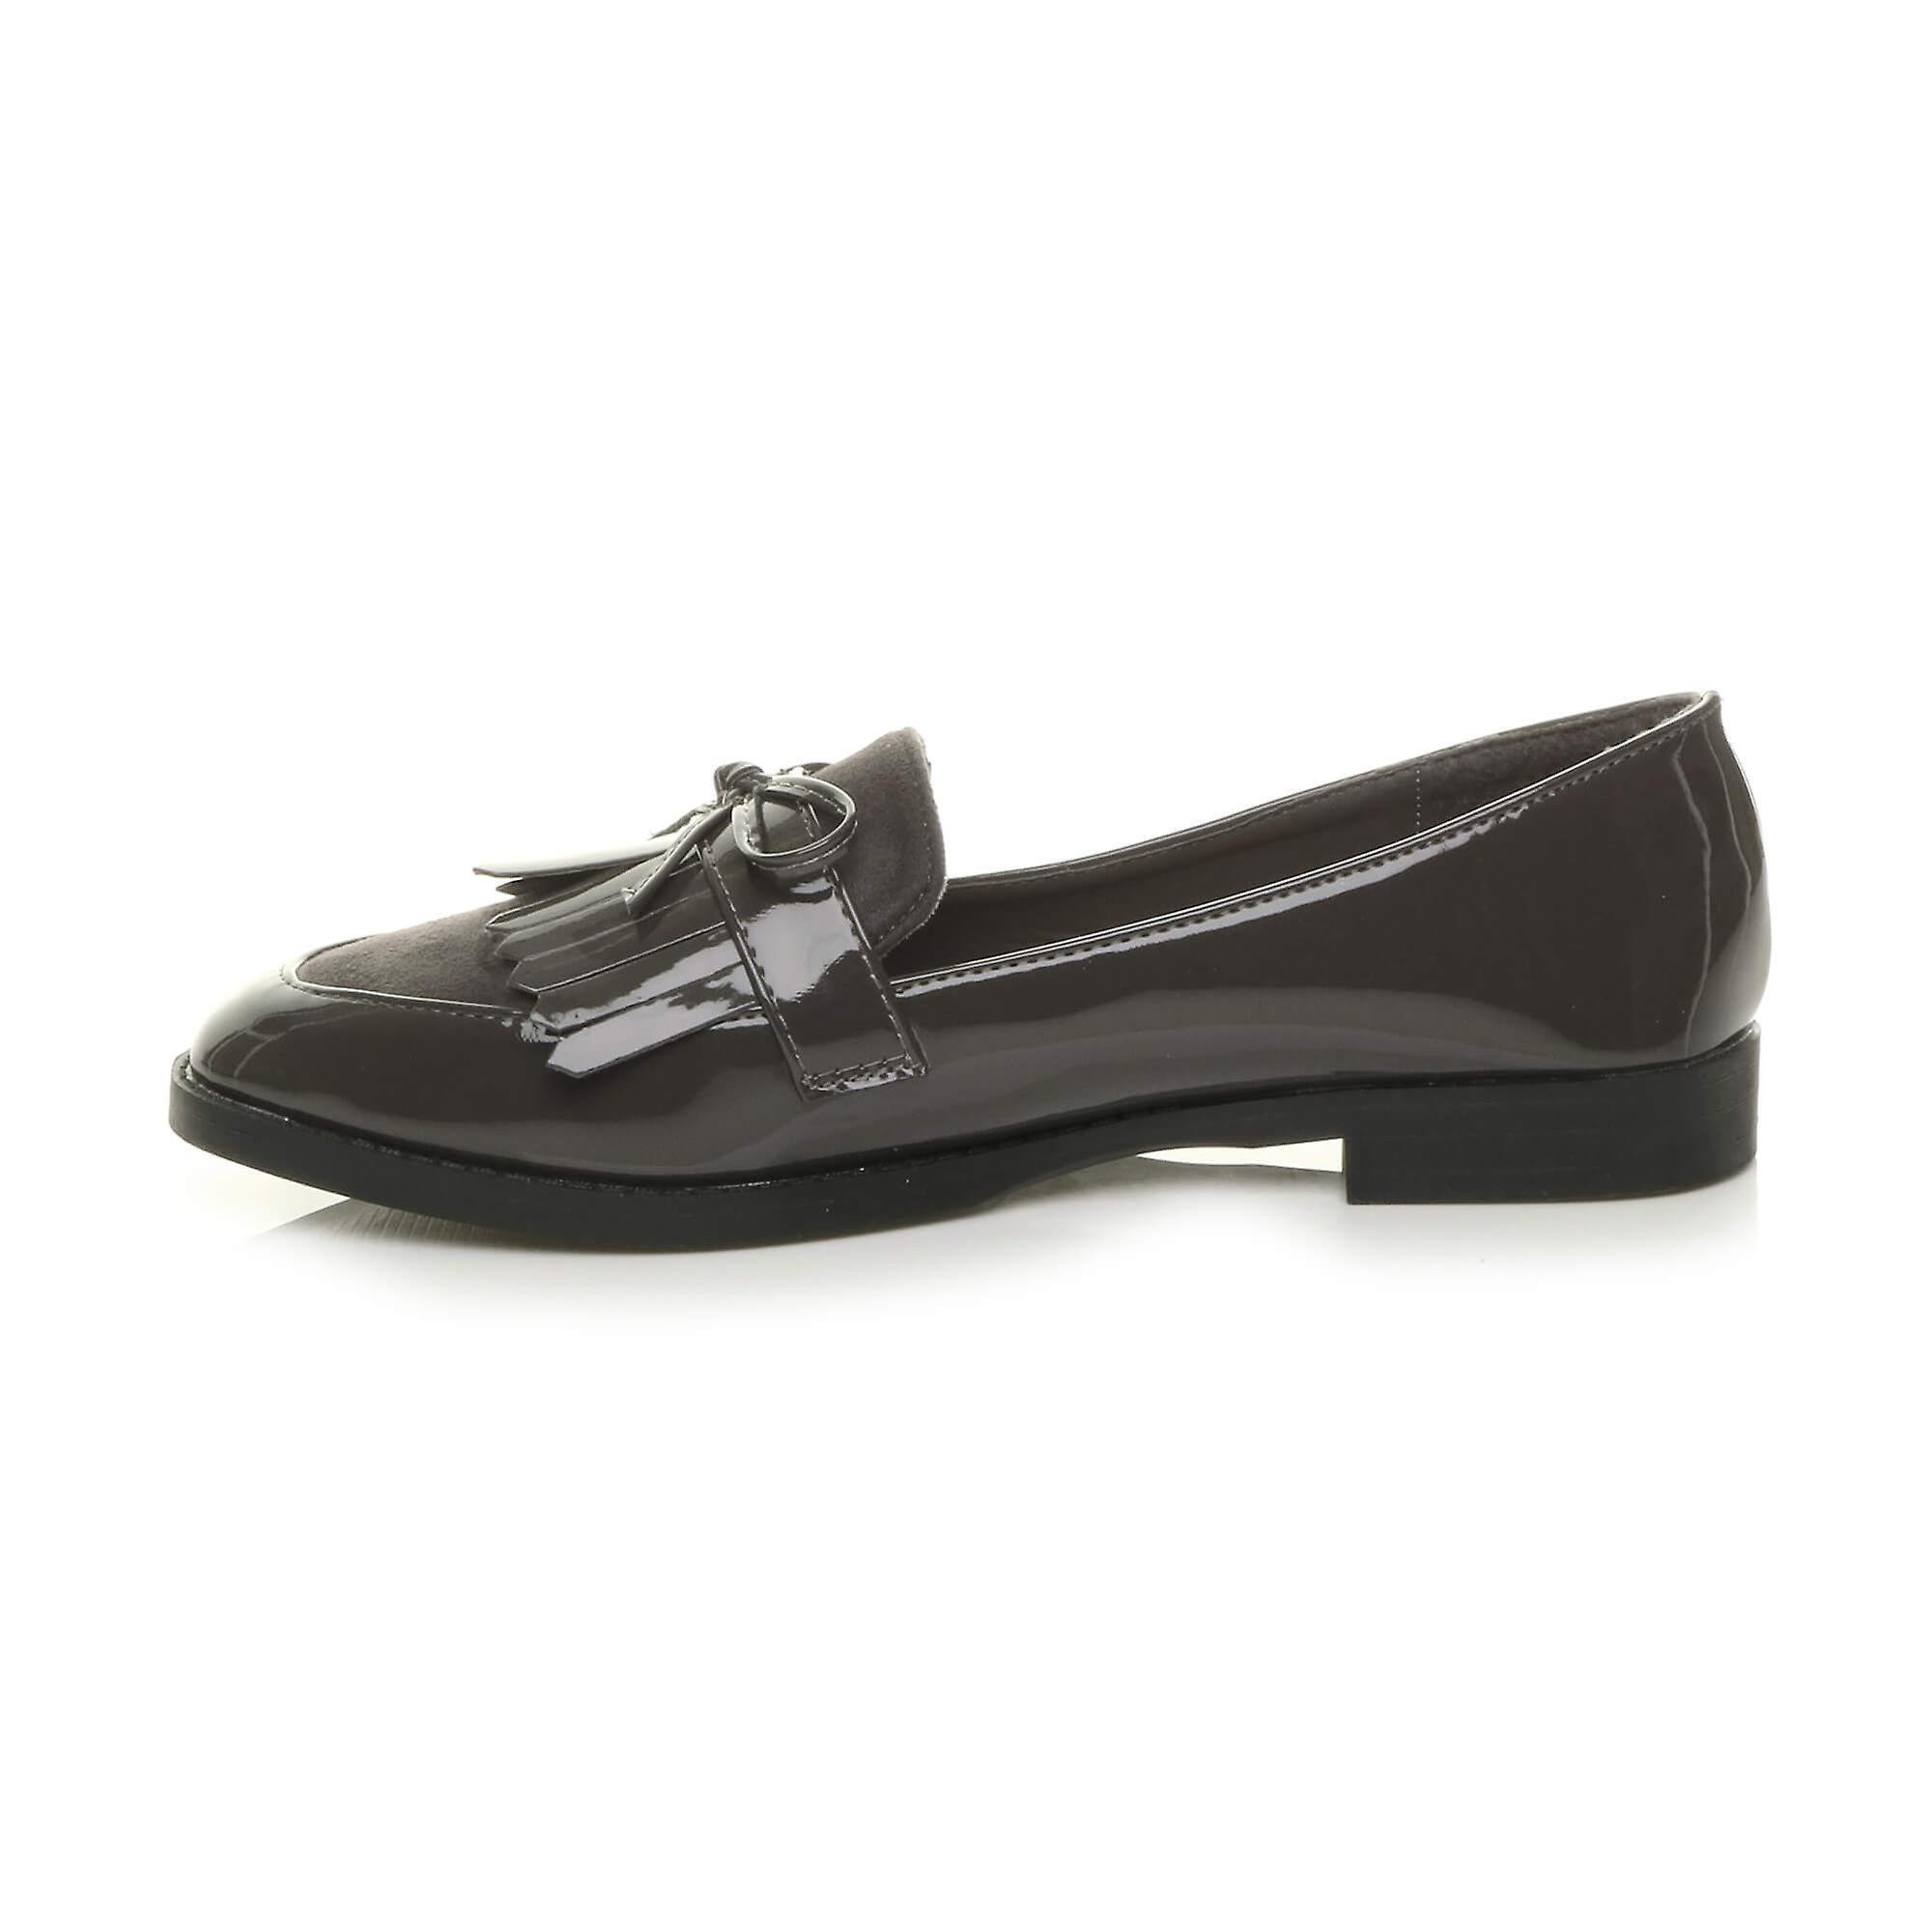 Ajvani Womens Flat Low Heel Smart Casual Slip On Fringe Loafers Work Shoes